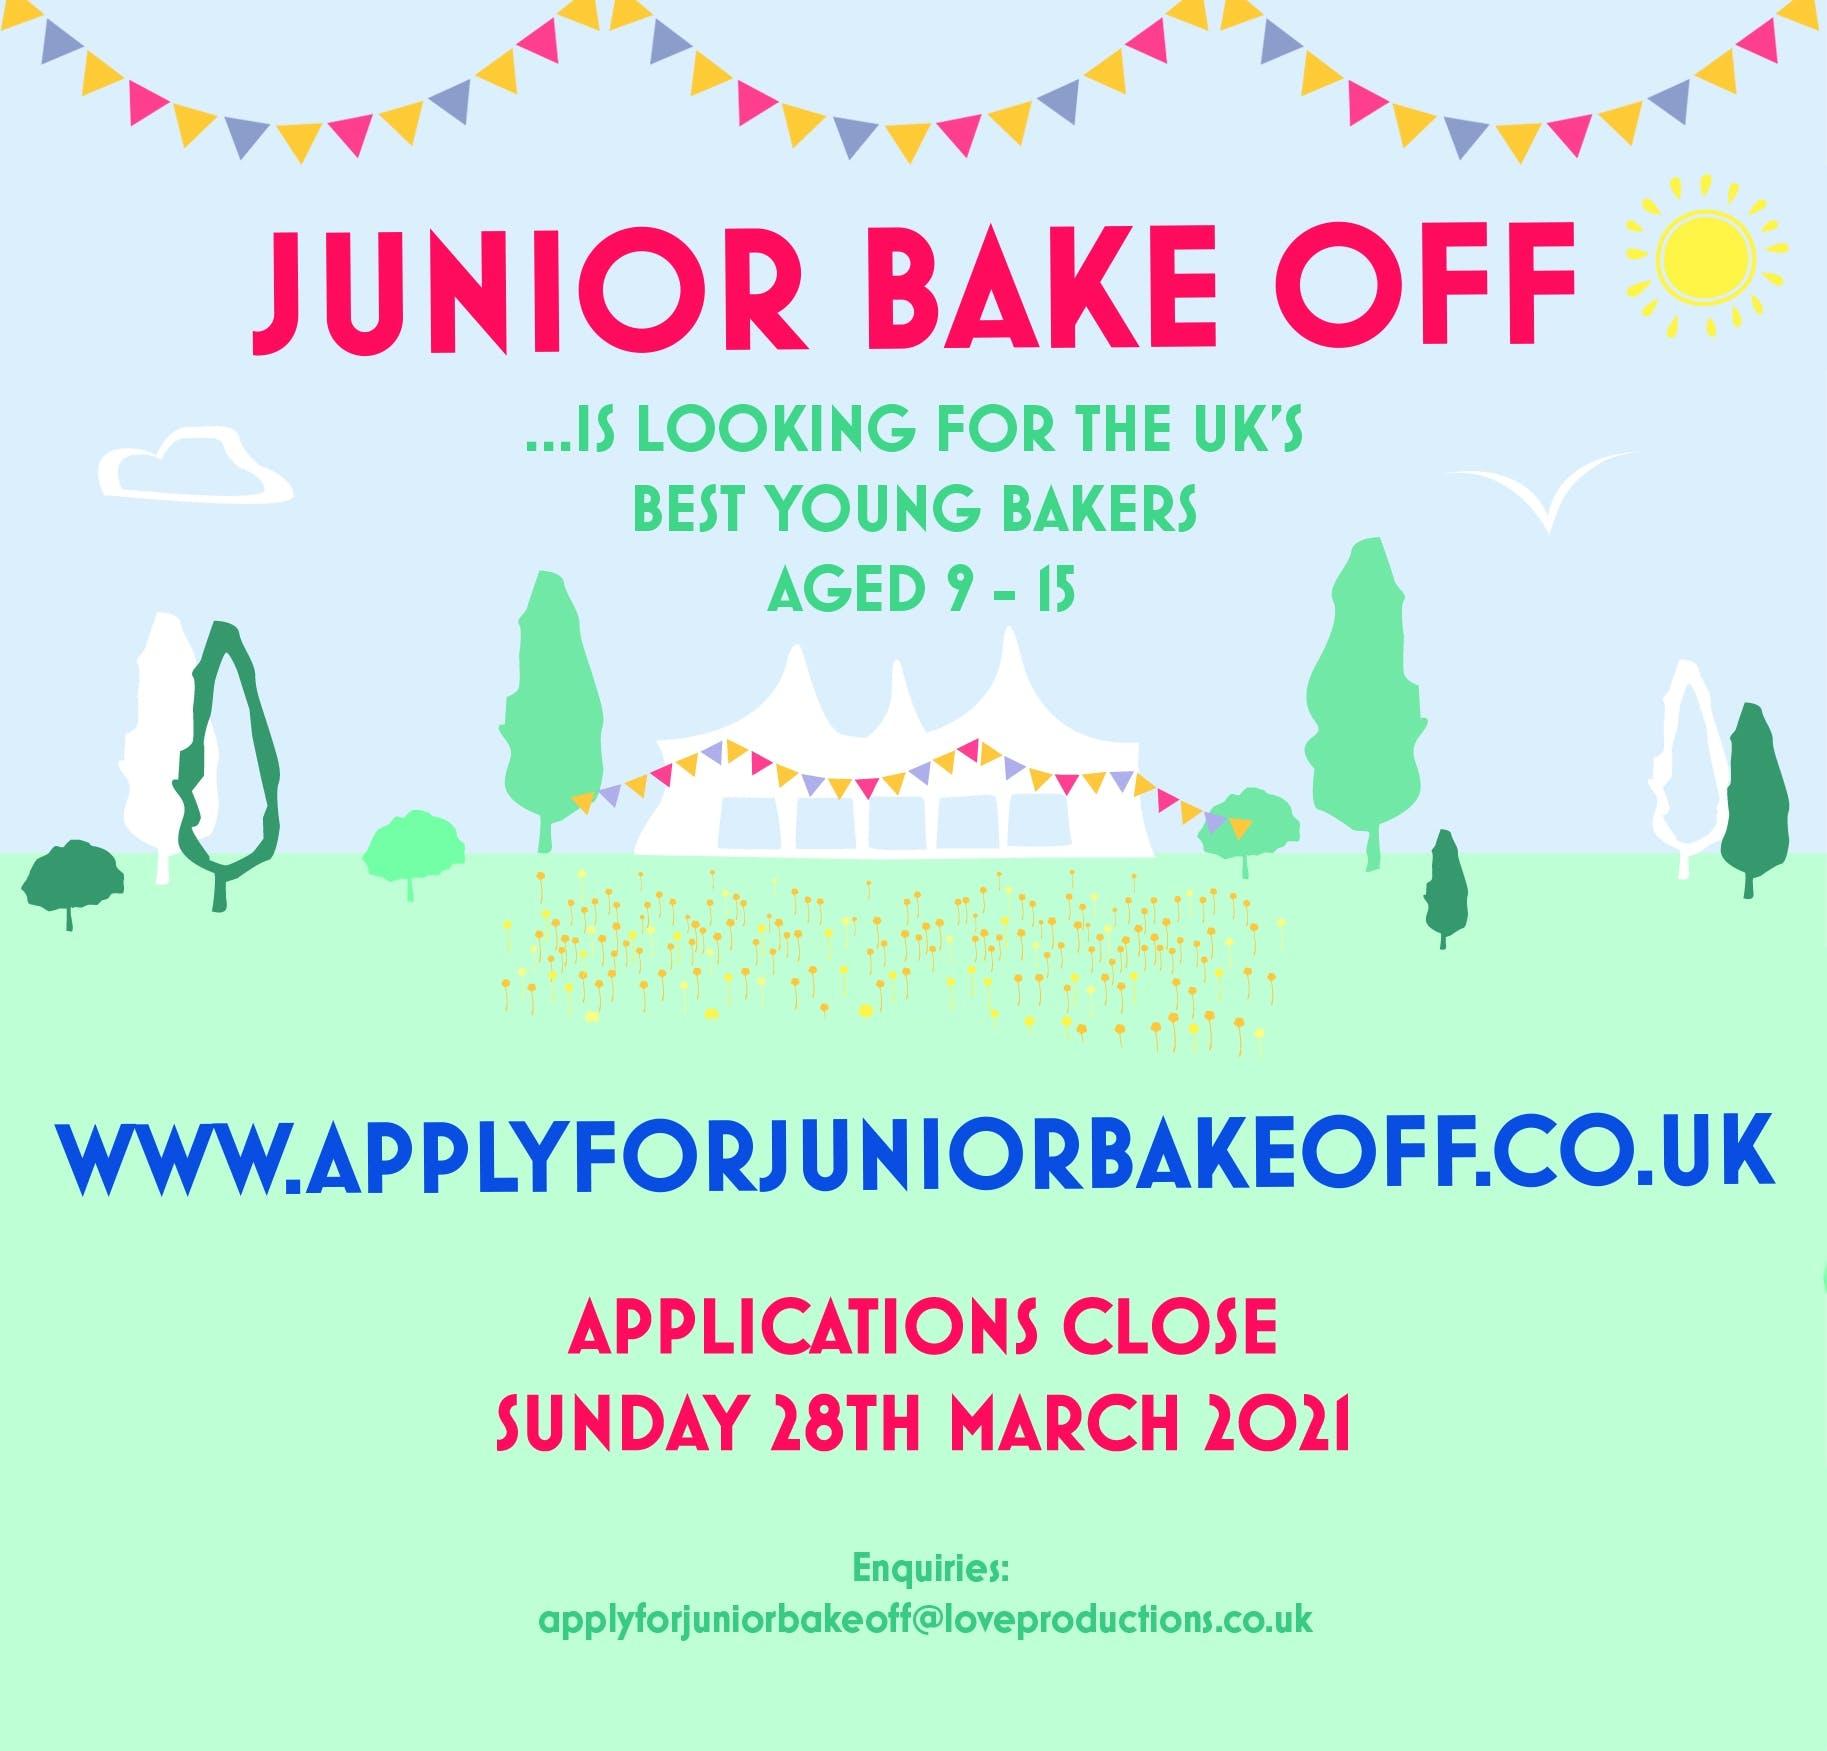 Junior Bake Off 2021